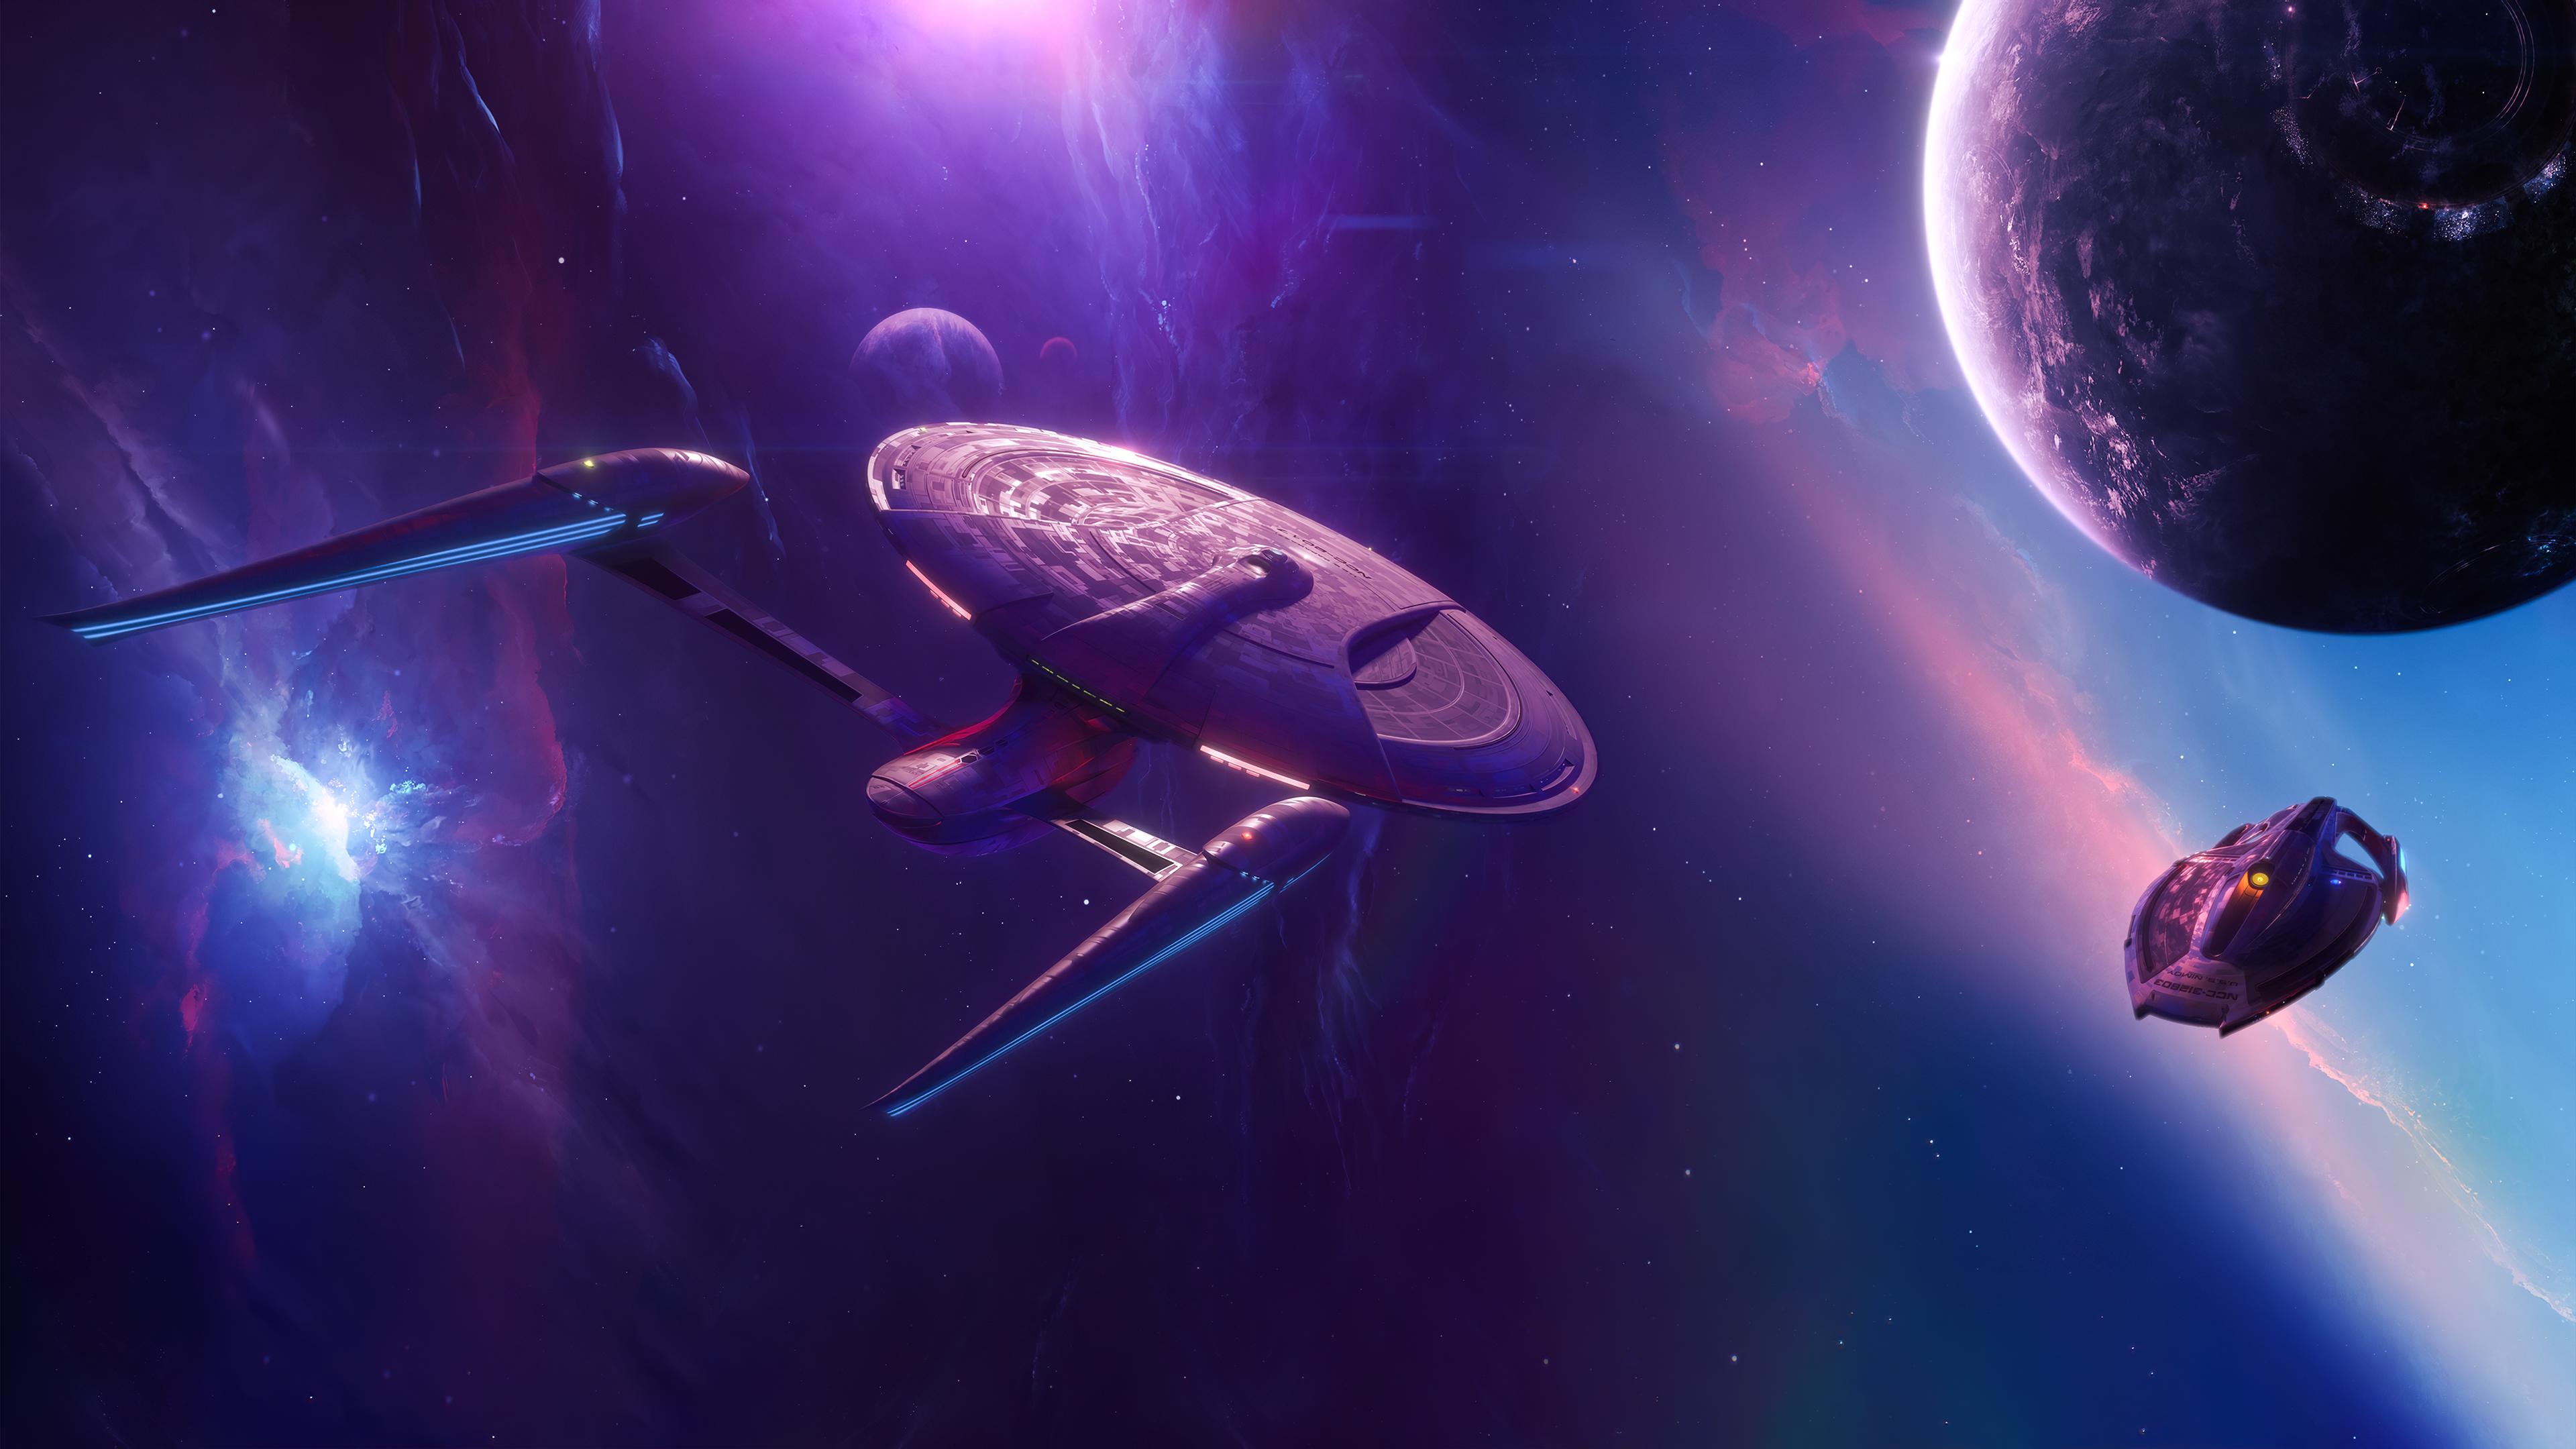 Dedication Class Starship By Andrew Gavrilov 3840x2160 Starship Lego Wallpaper Music Wallpaper